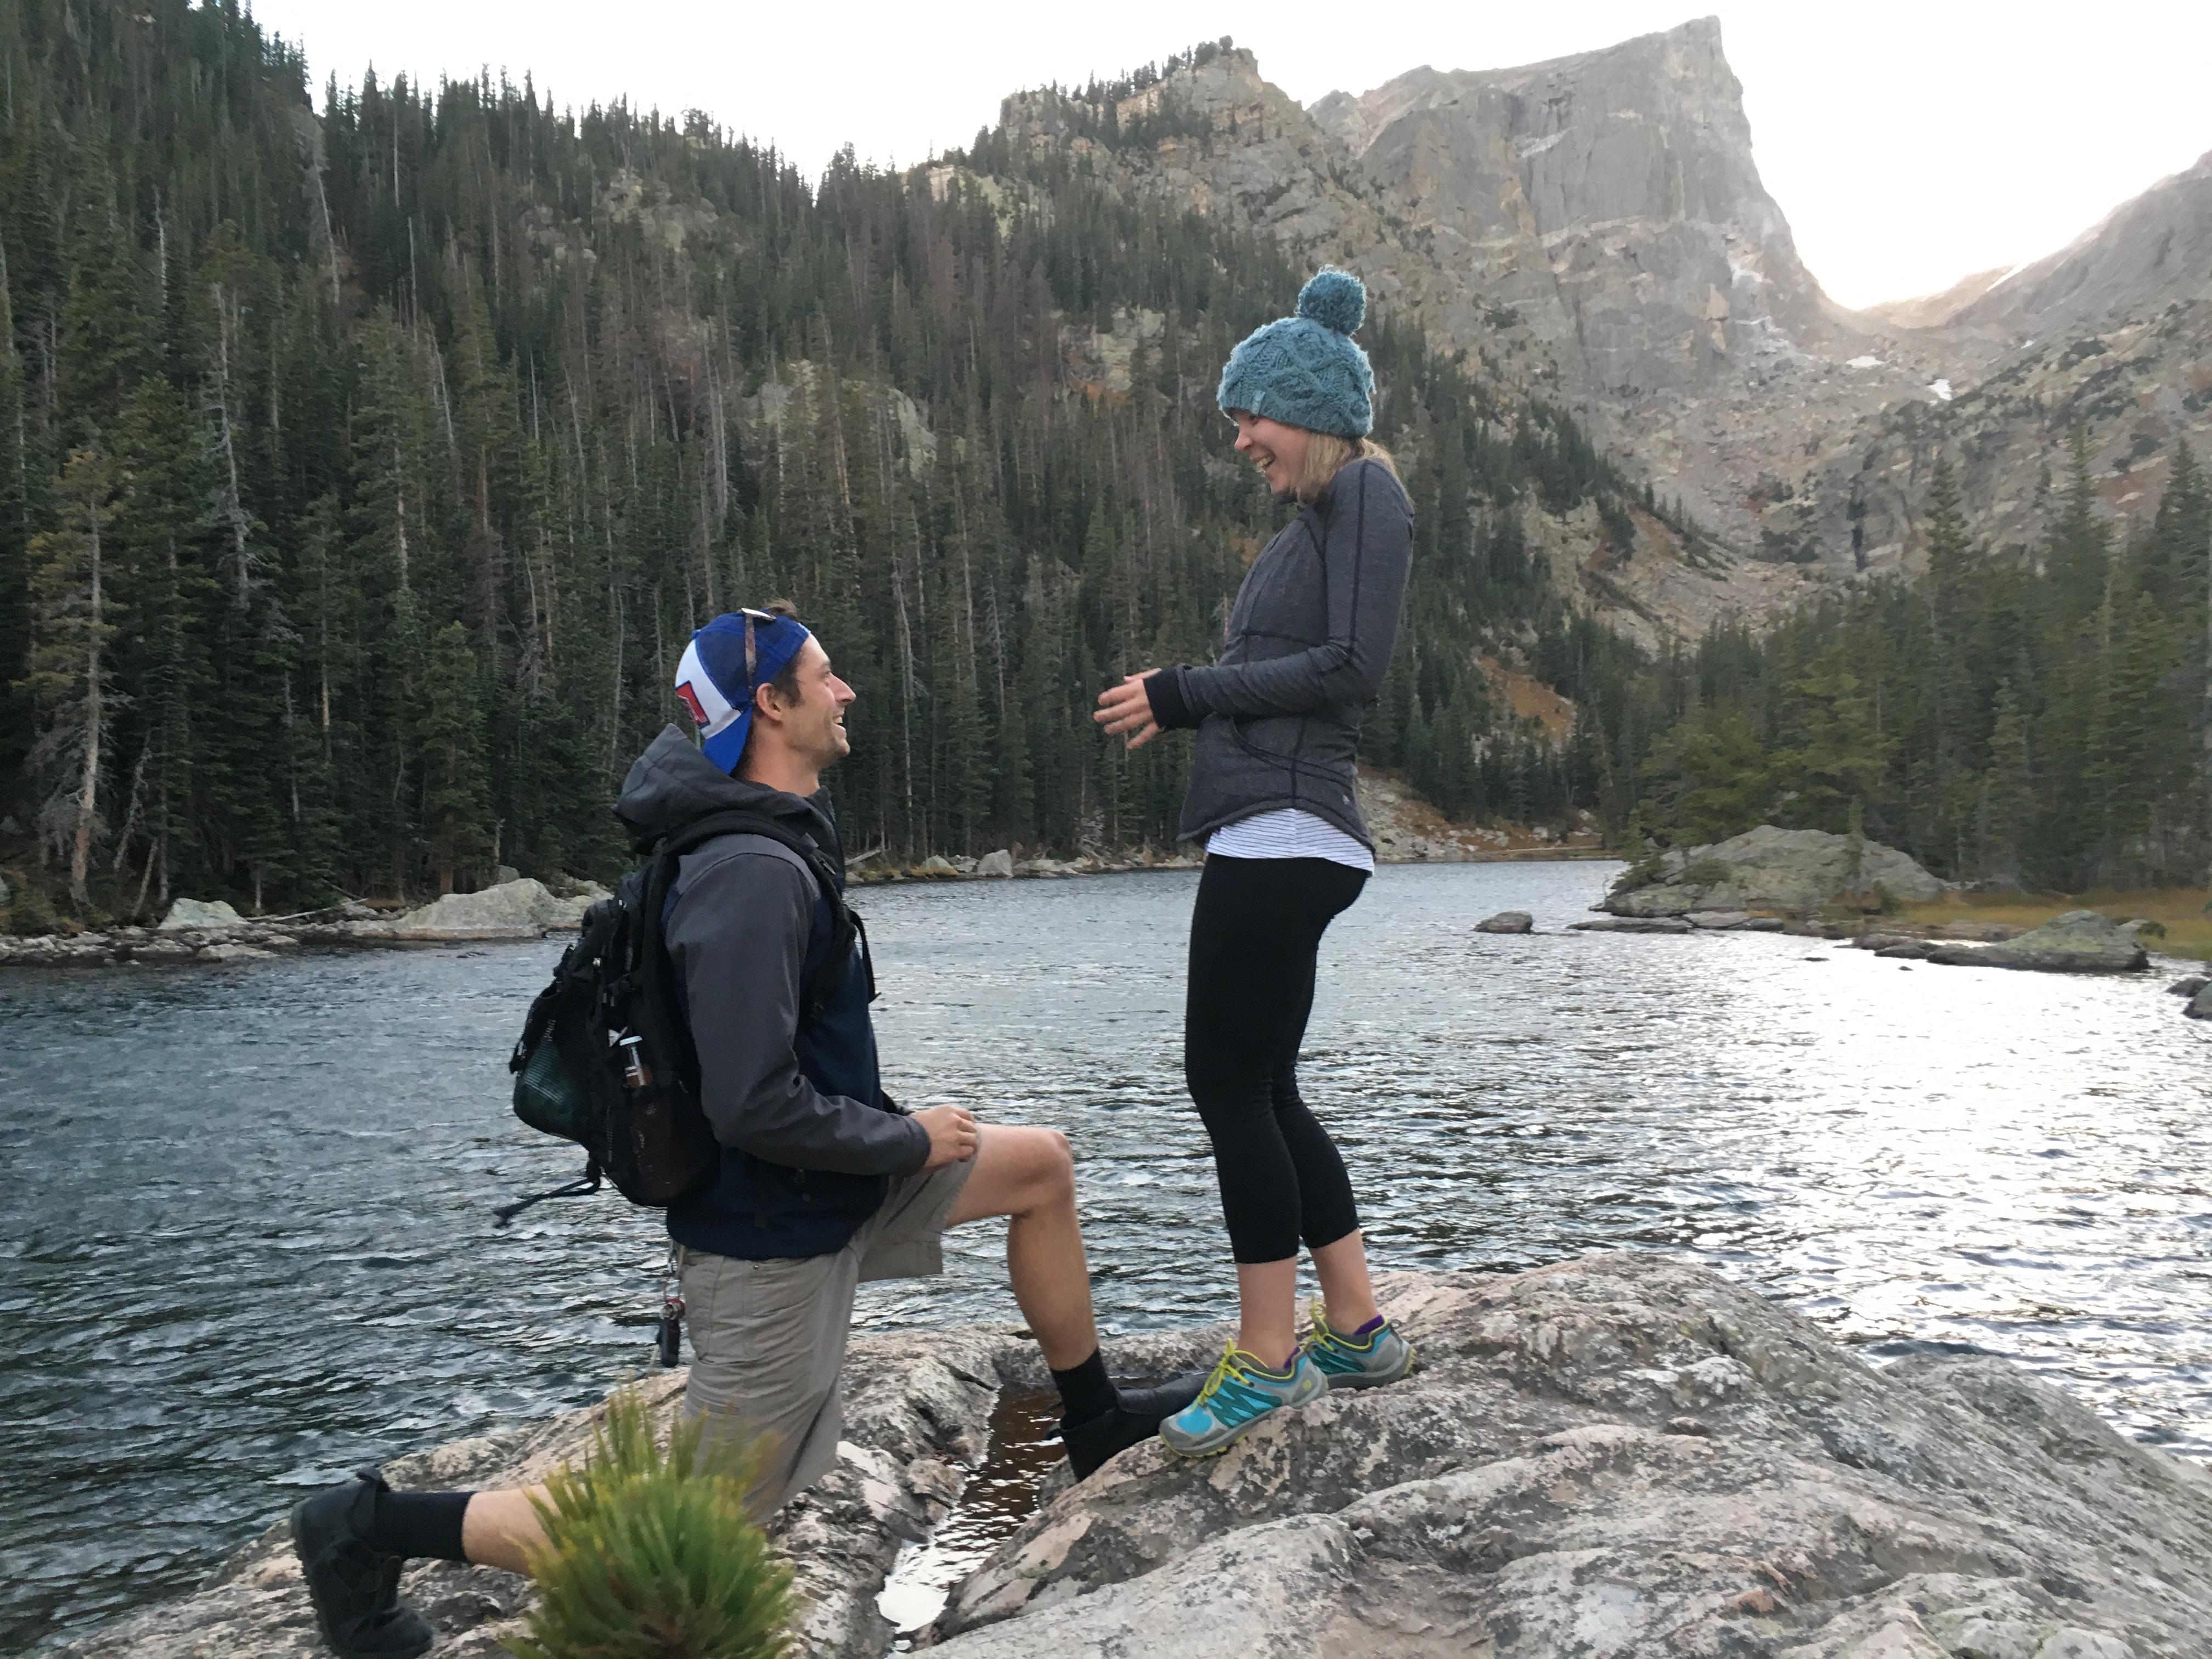 Rew proposing to Liza